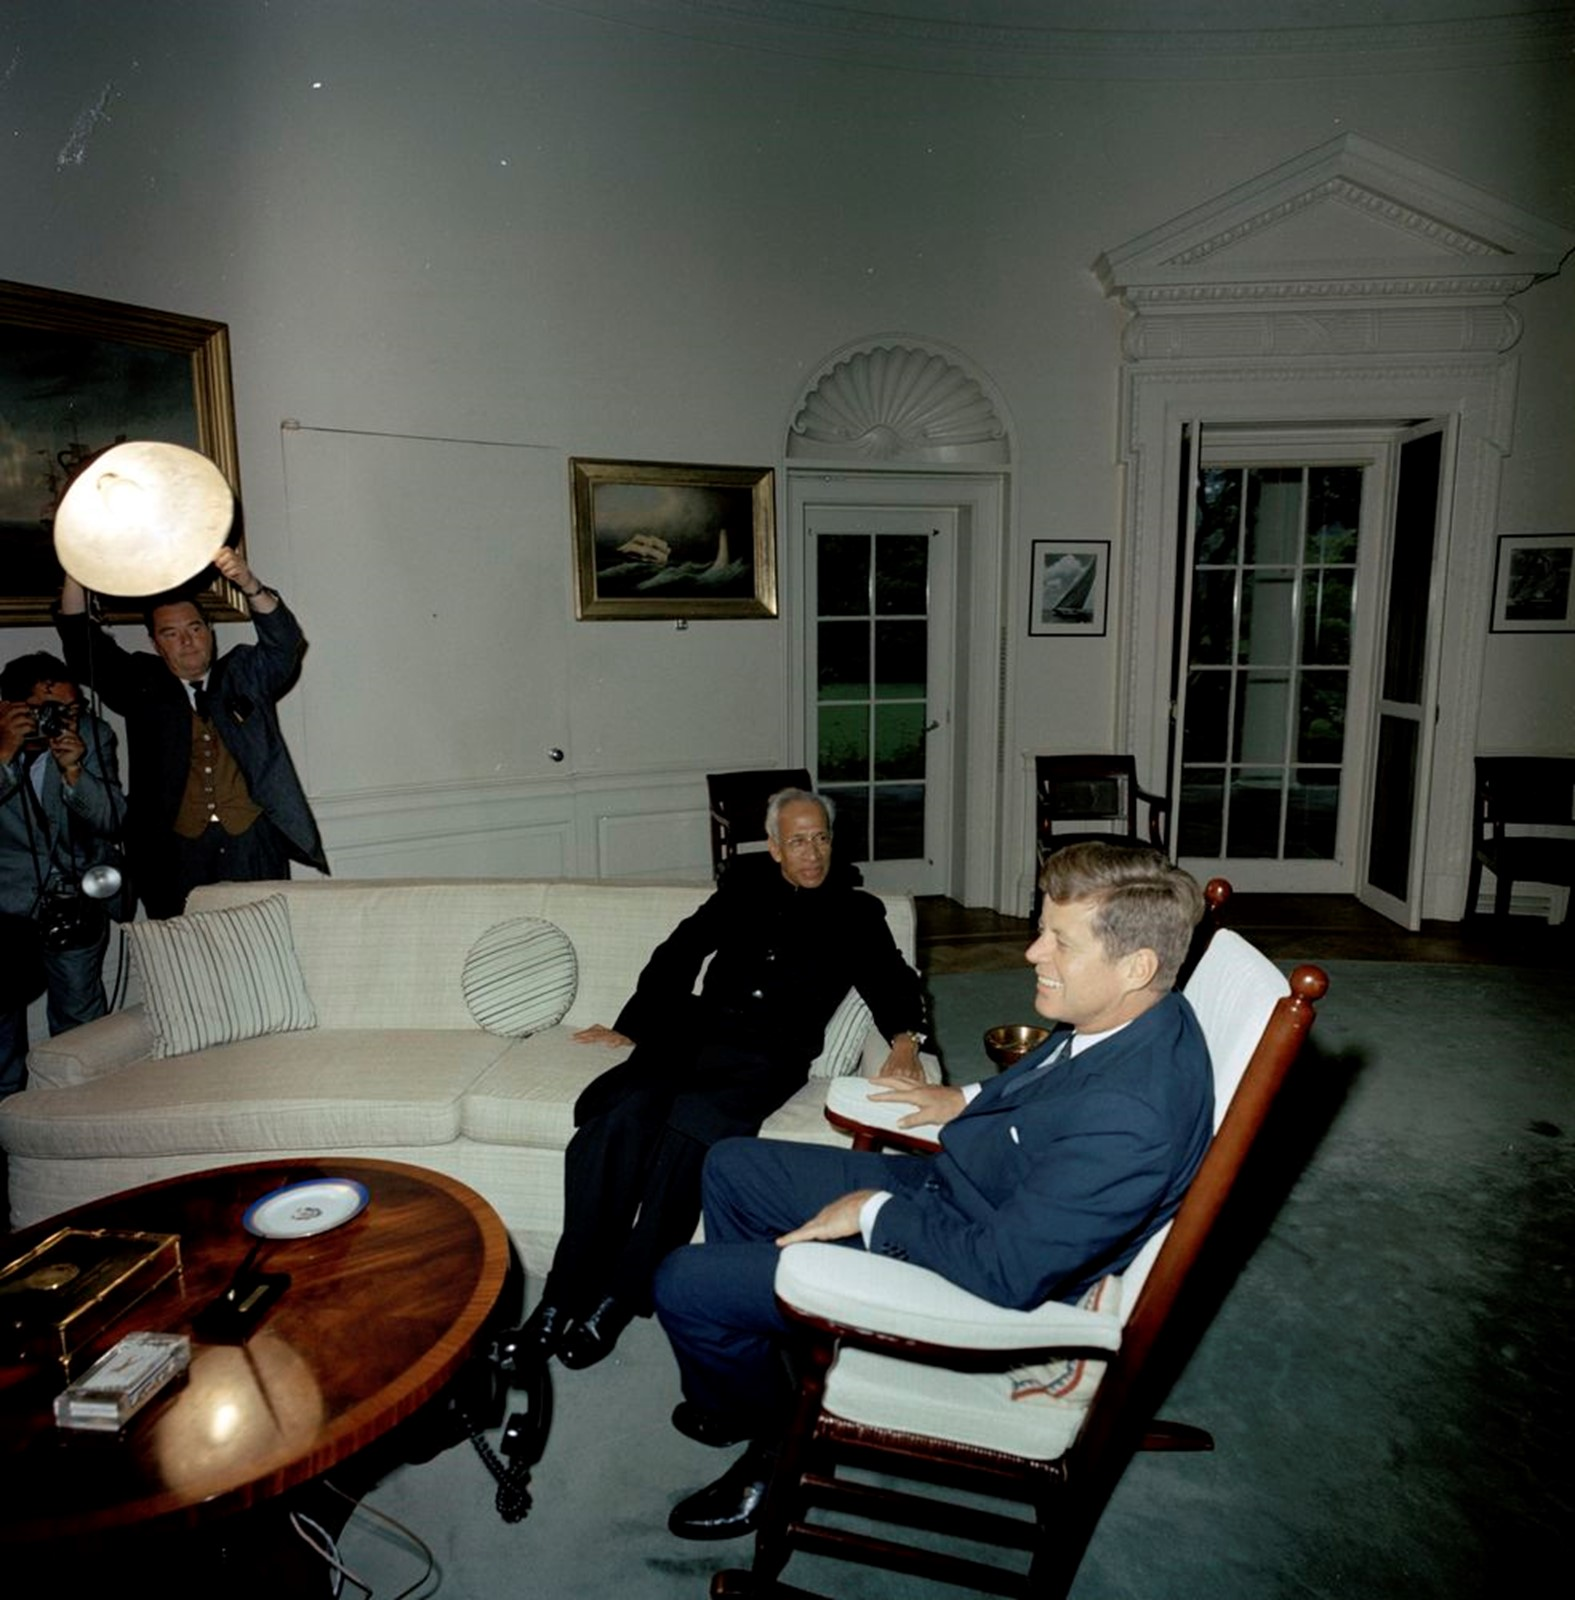 September 05. Dr. Sarvepalli Radhakrishnan's birthday. My reflections on Madras – Tibet – US Family Connections.